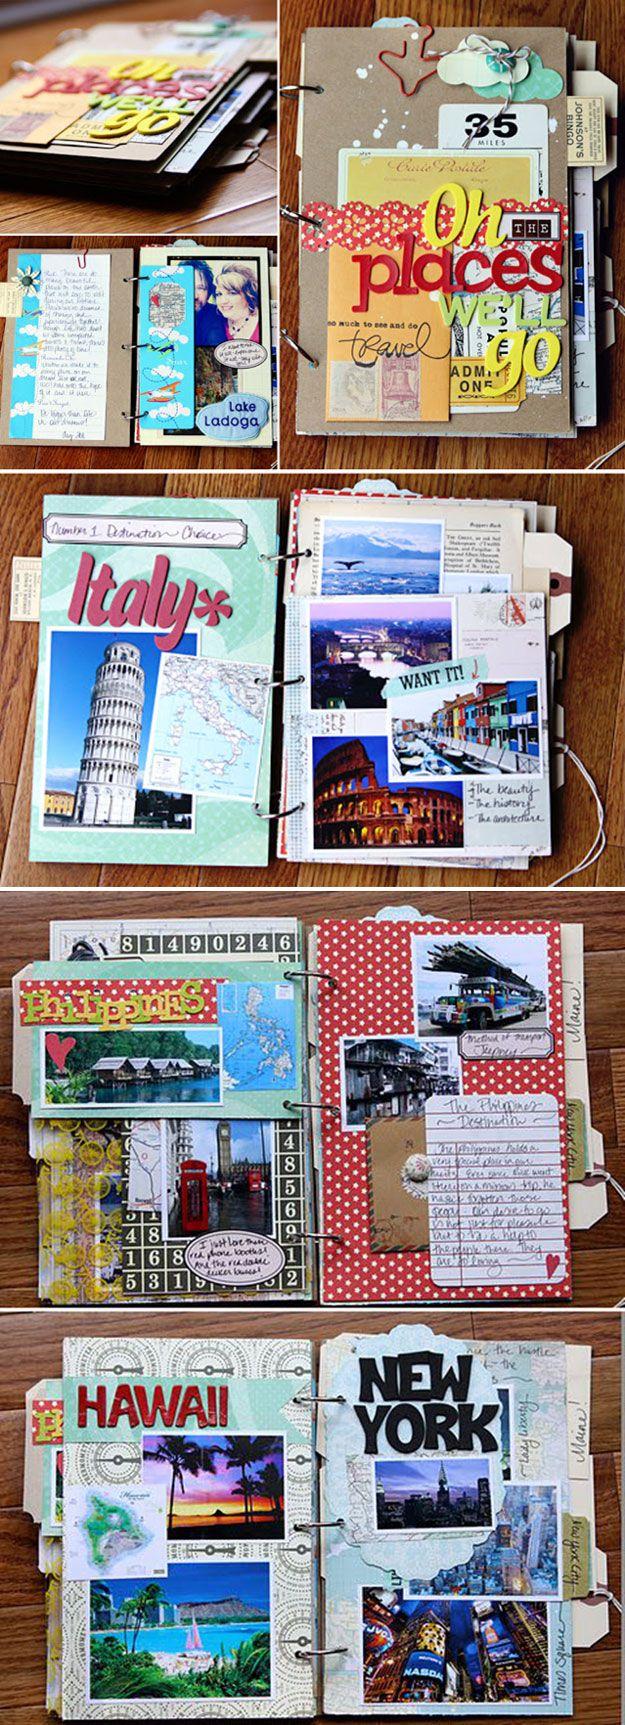 Easy baby scrapbook ideas - 33 Creative Scrapbook Ideas Every Crafter Should Know